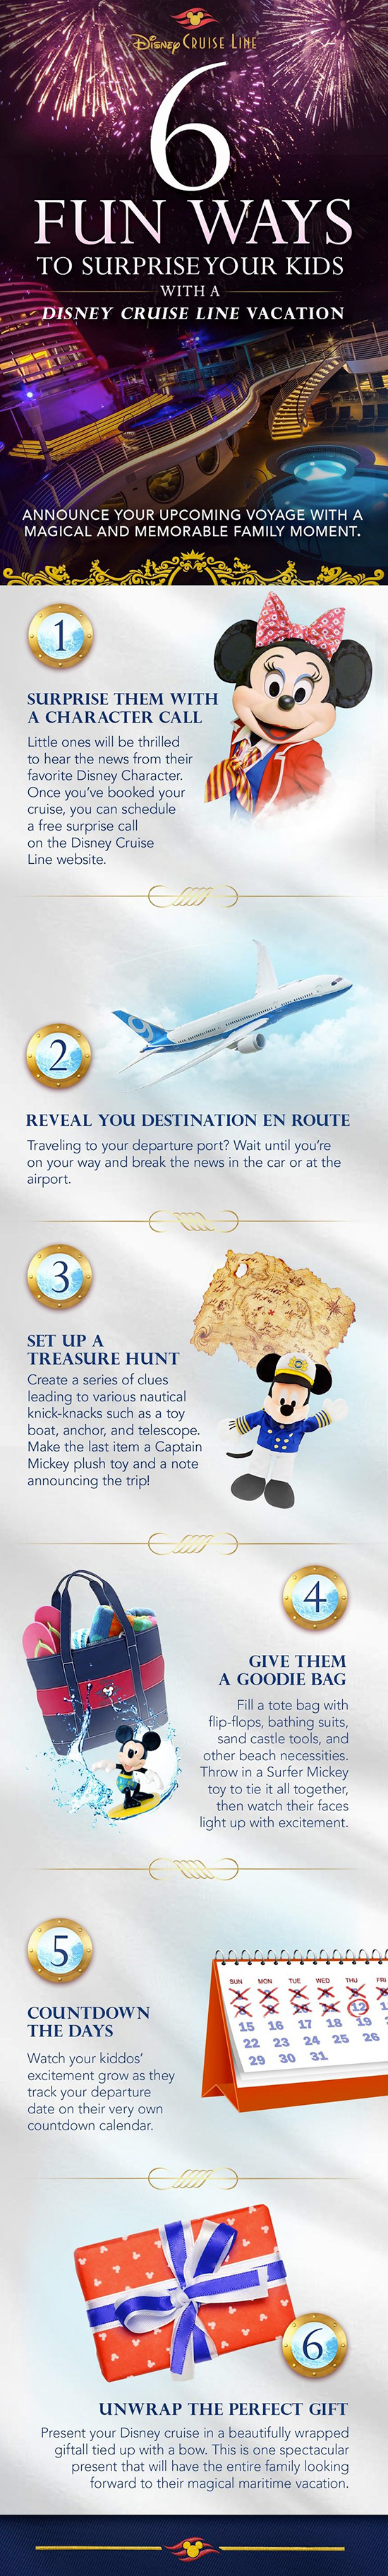 Six Fun Ways To Surprise Your Kids With A Disney Cruise Disney - Toy disney cruise ship